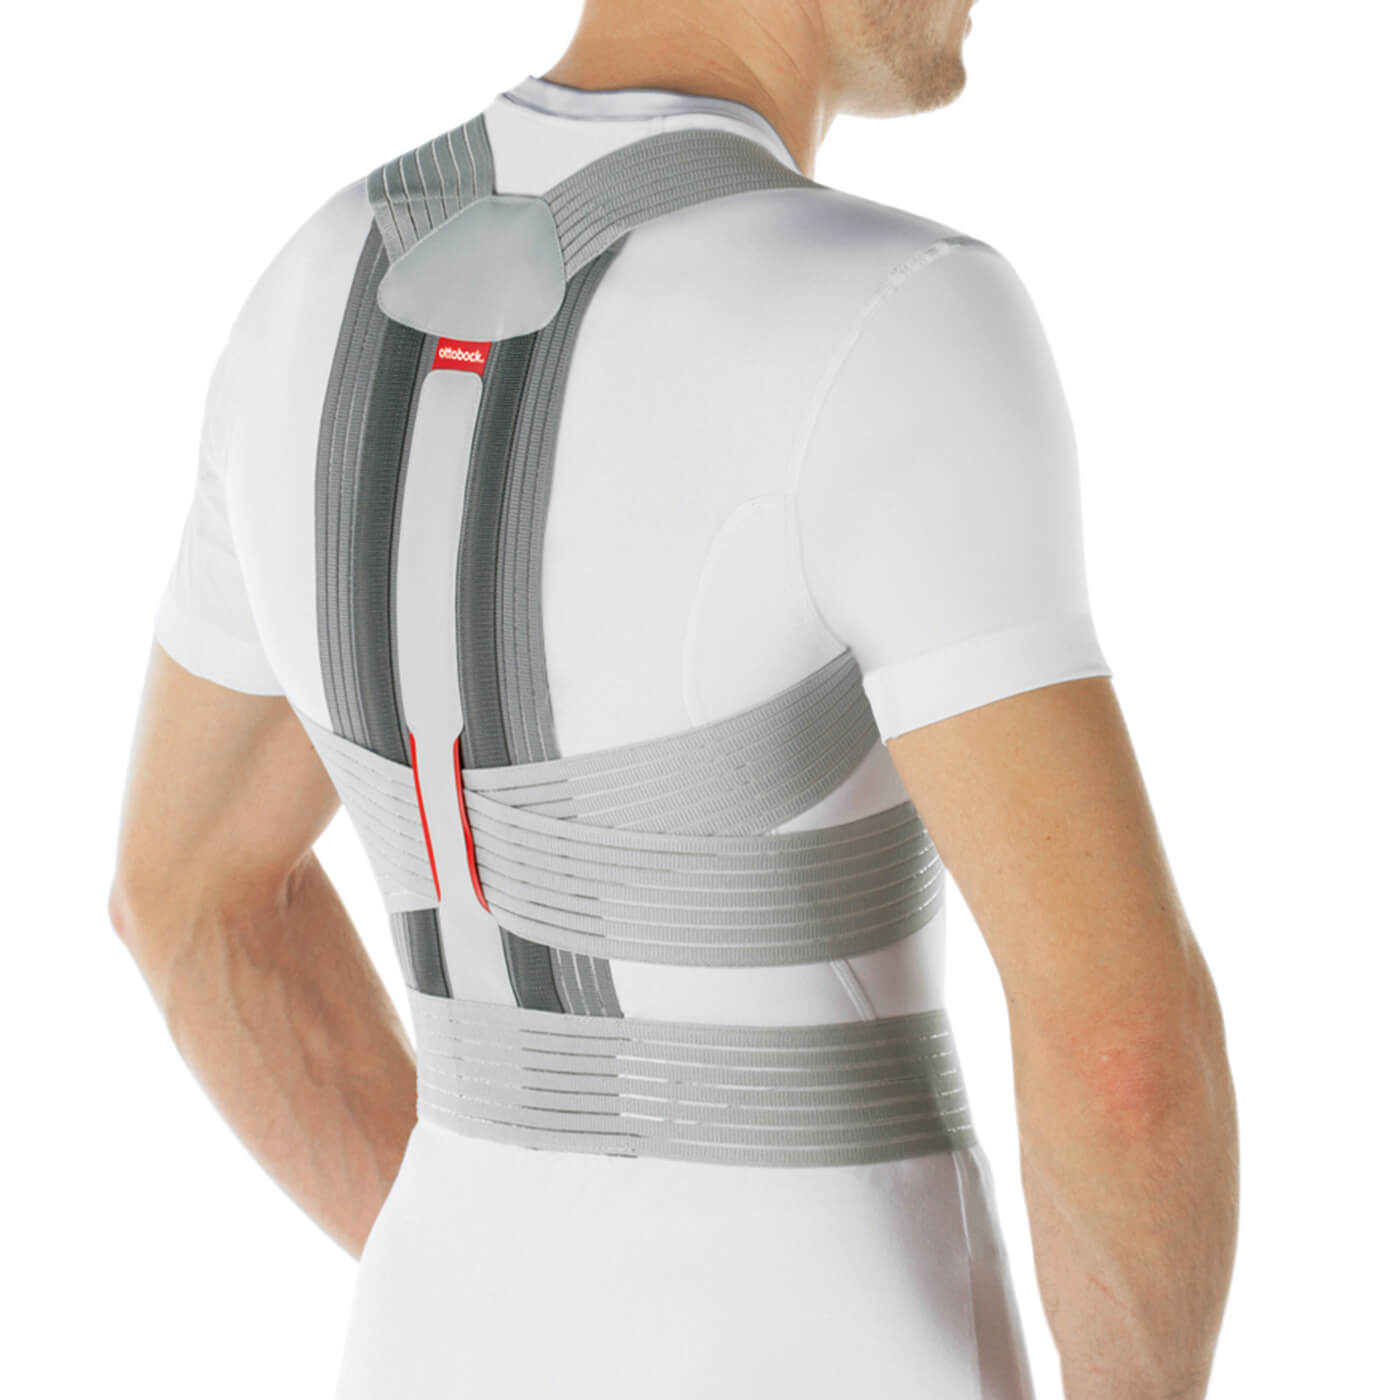 Корректор осанки ортопедический (реклинатор) Dorso Carezza Posture Арт. 50R49 XXS (60-70 см) фото